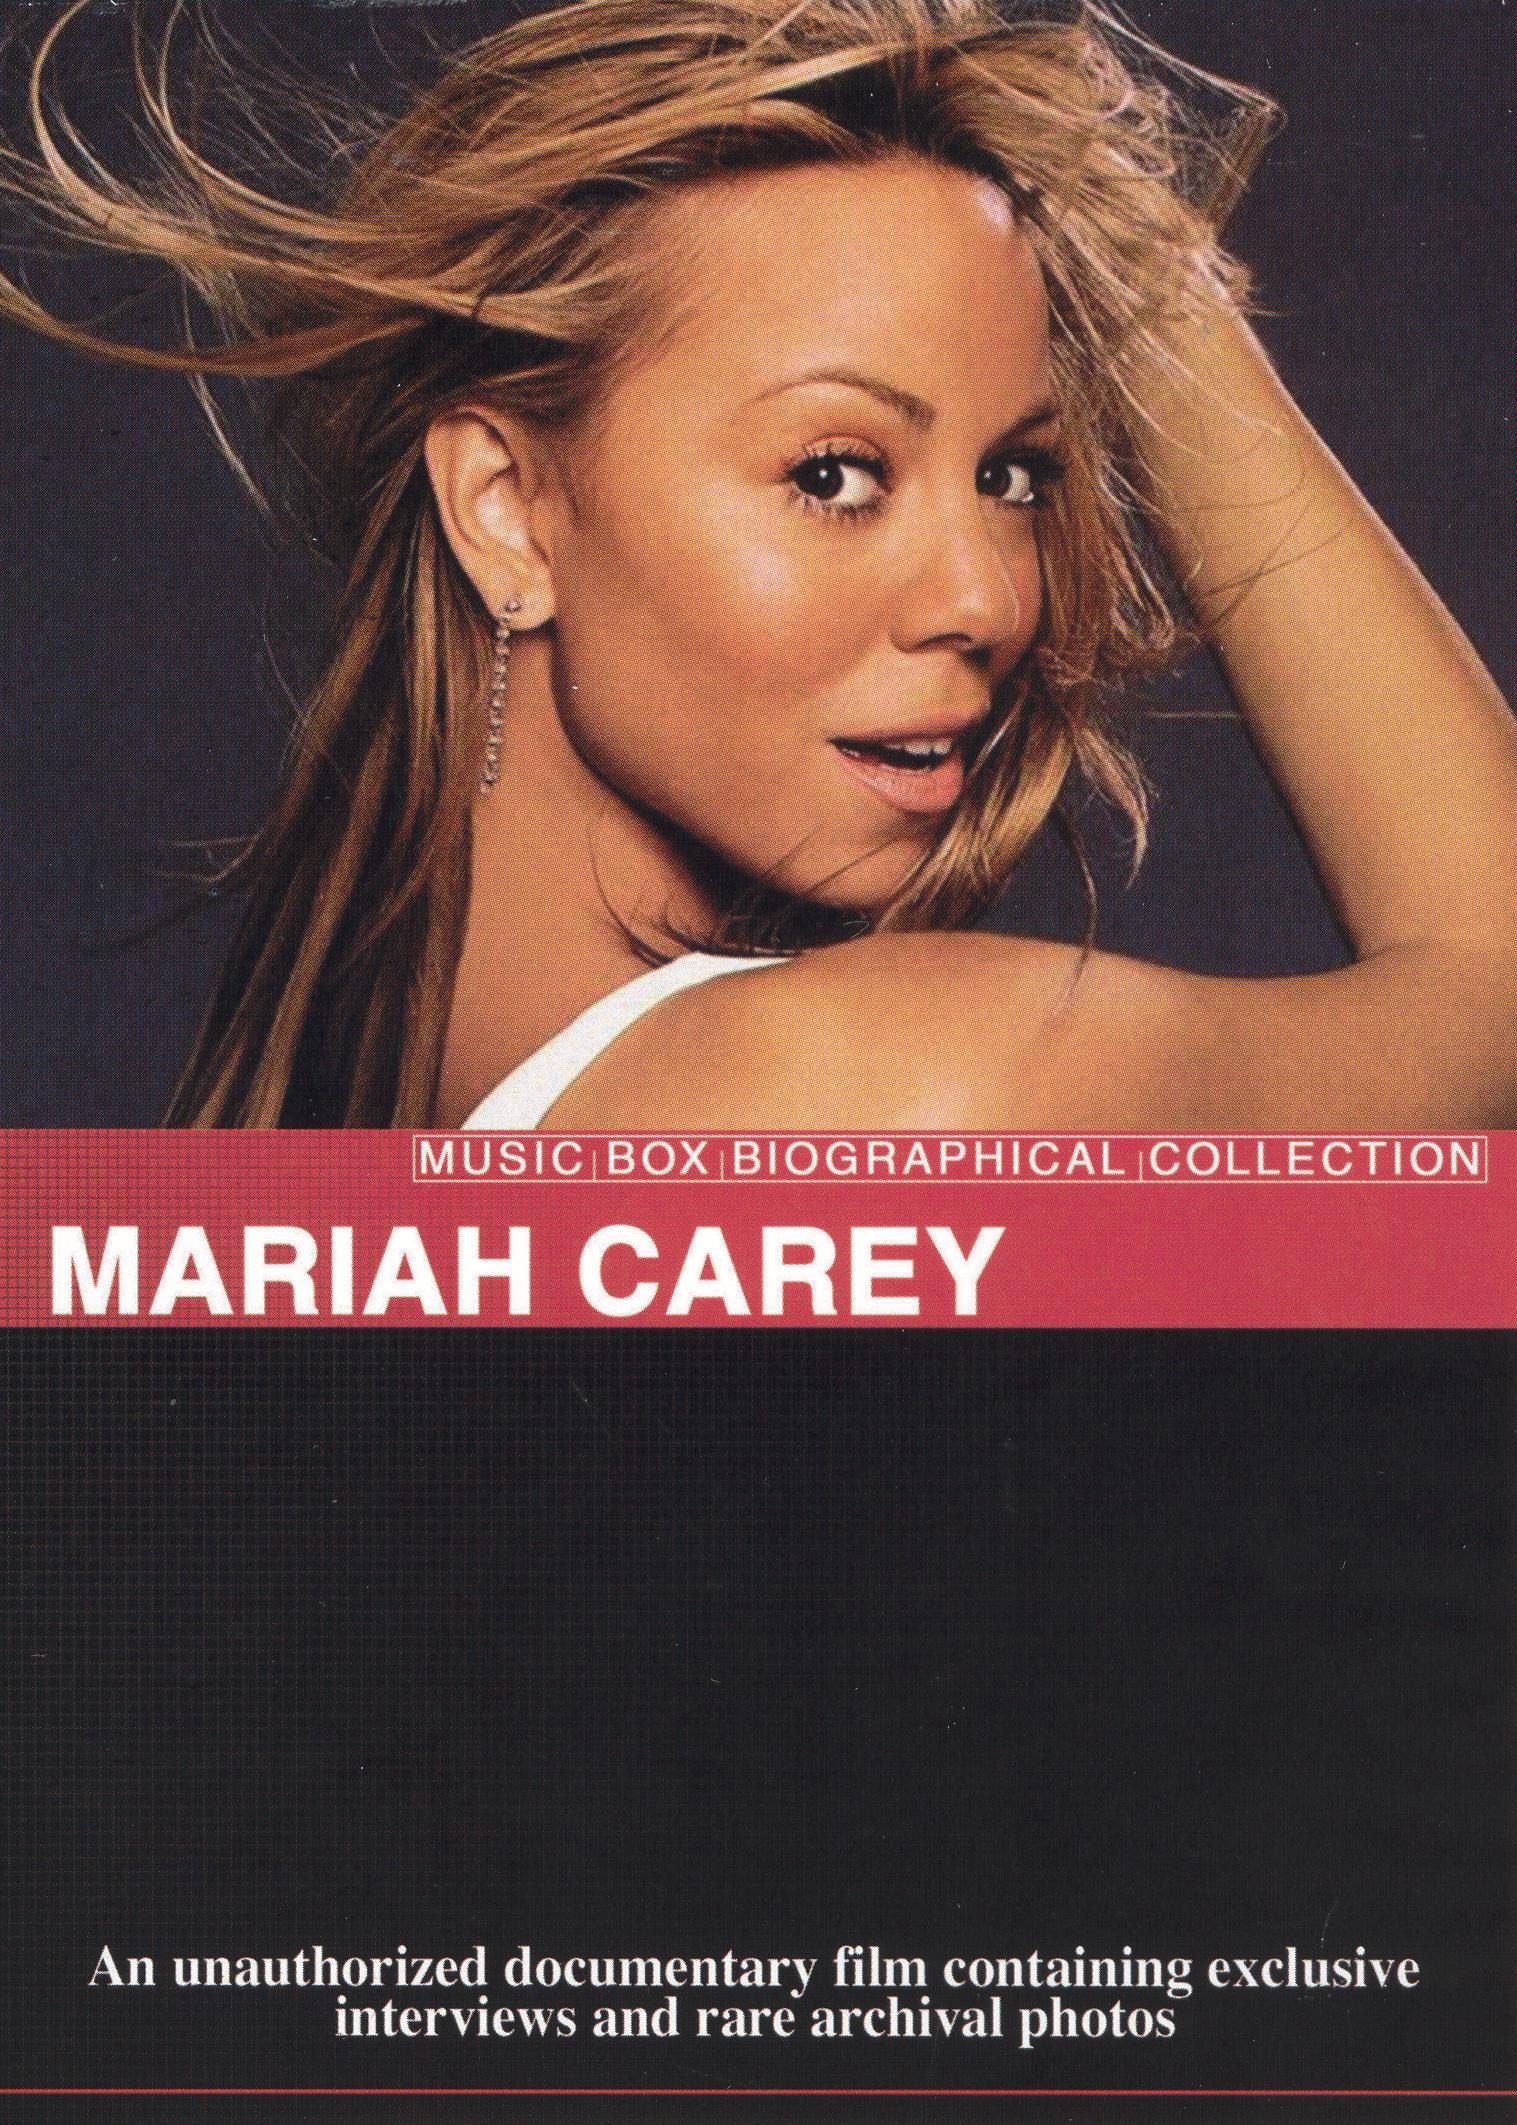 Music Box Biographical Collection: Mariah Carey